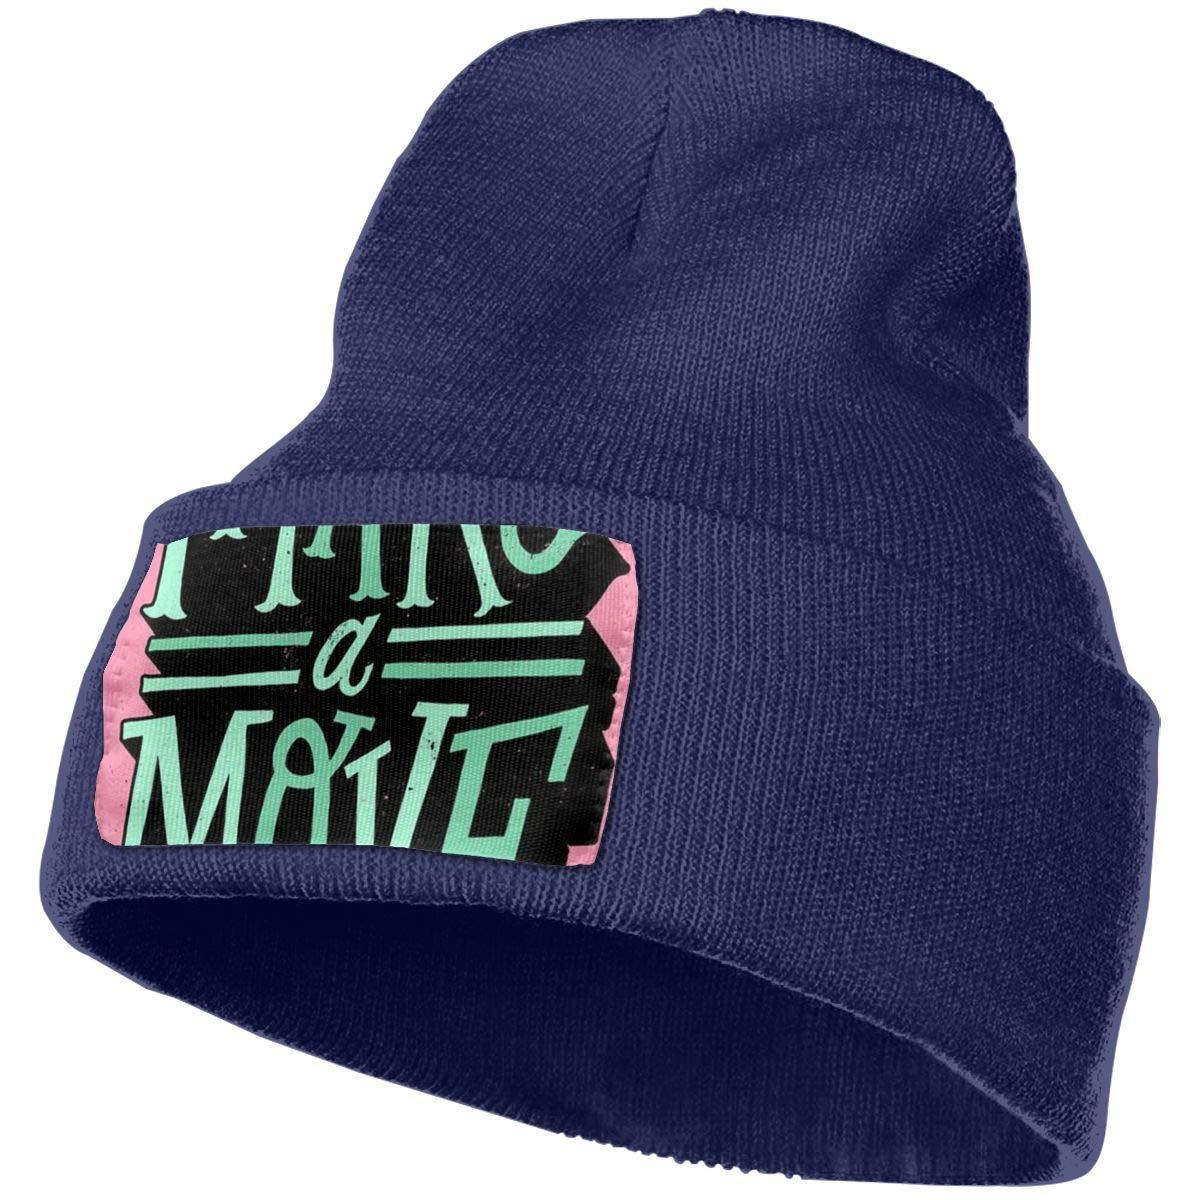 Make A Move Men /& Women 100/% Acrylic Knitting Beanie Hat Slouchy Jogging Beanie